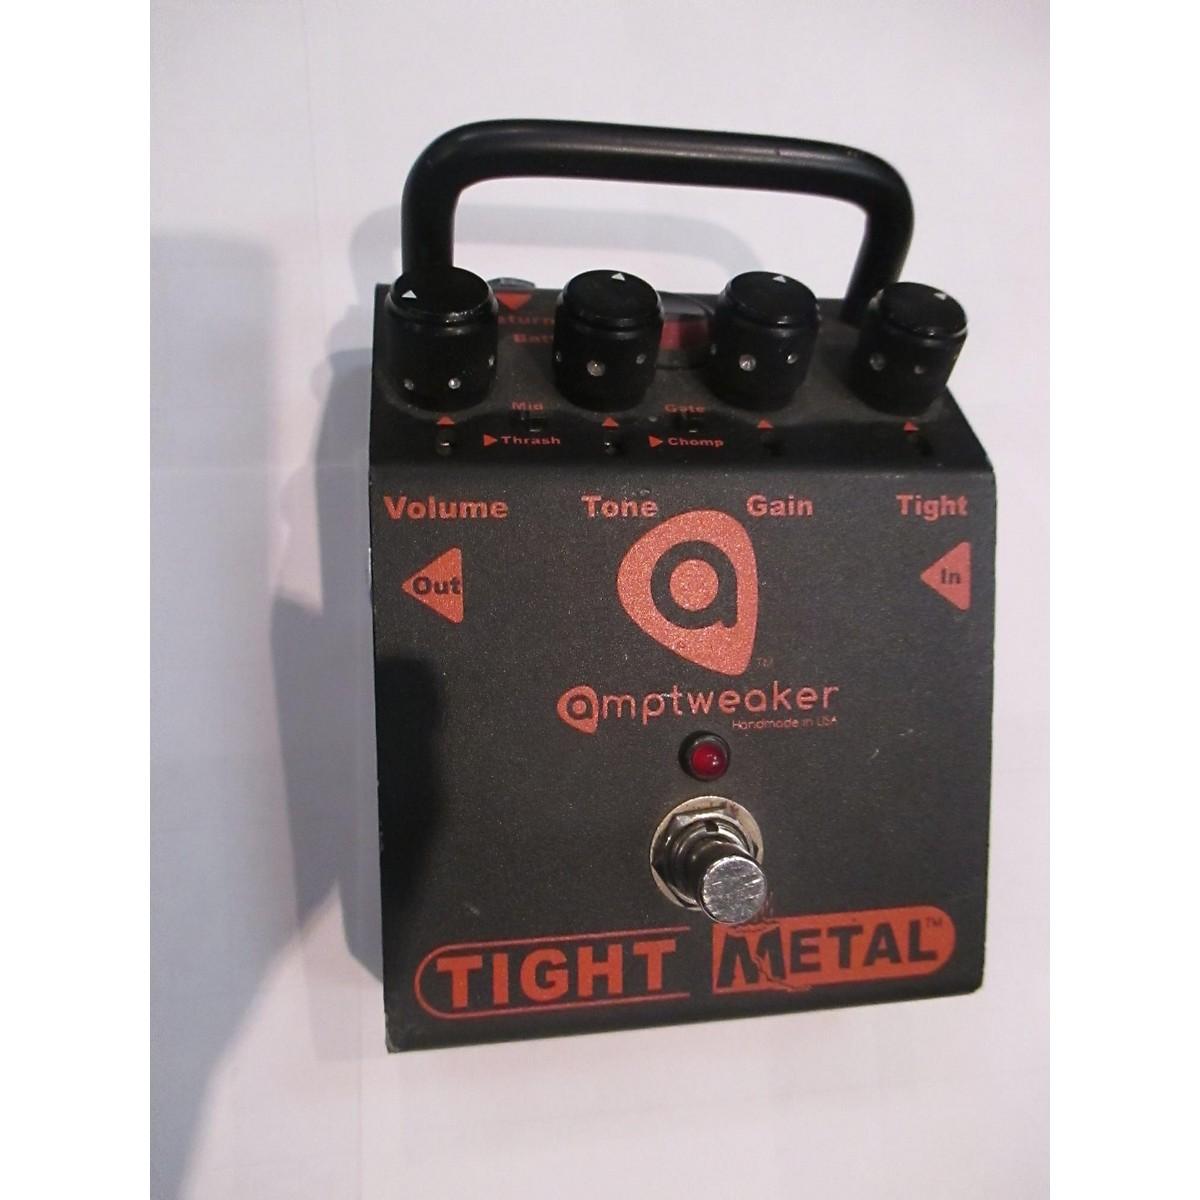 Amptweaker 2005 TIGHT METAL Effect Pedal